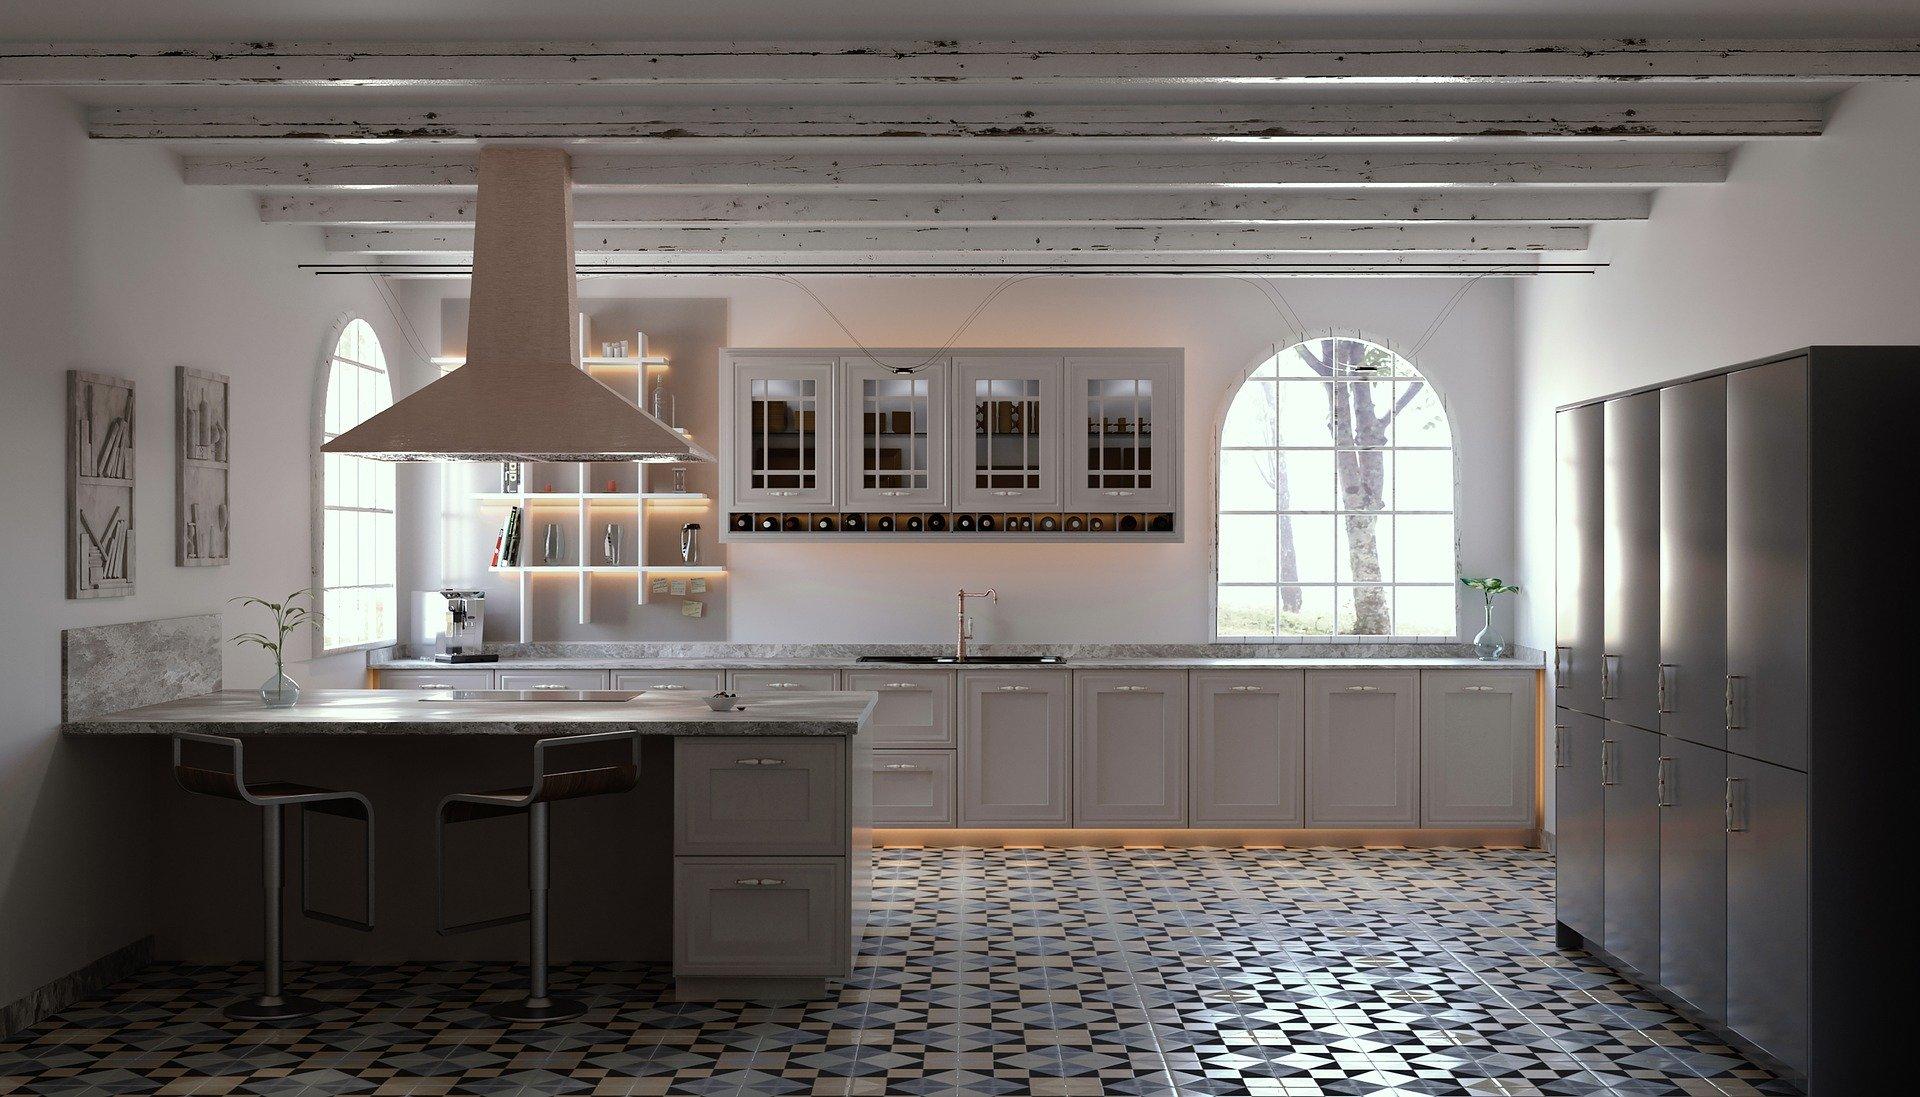 Cucina con pavimento vintage